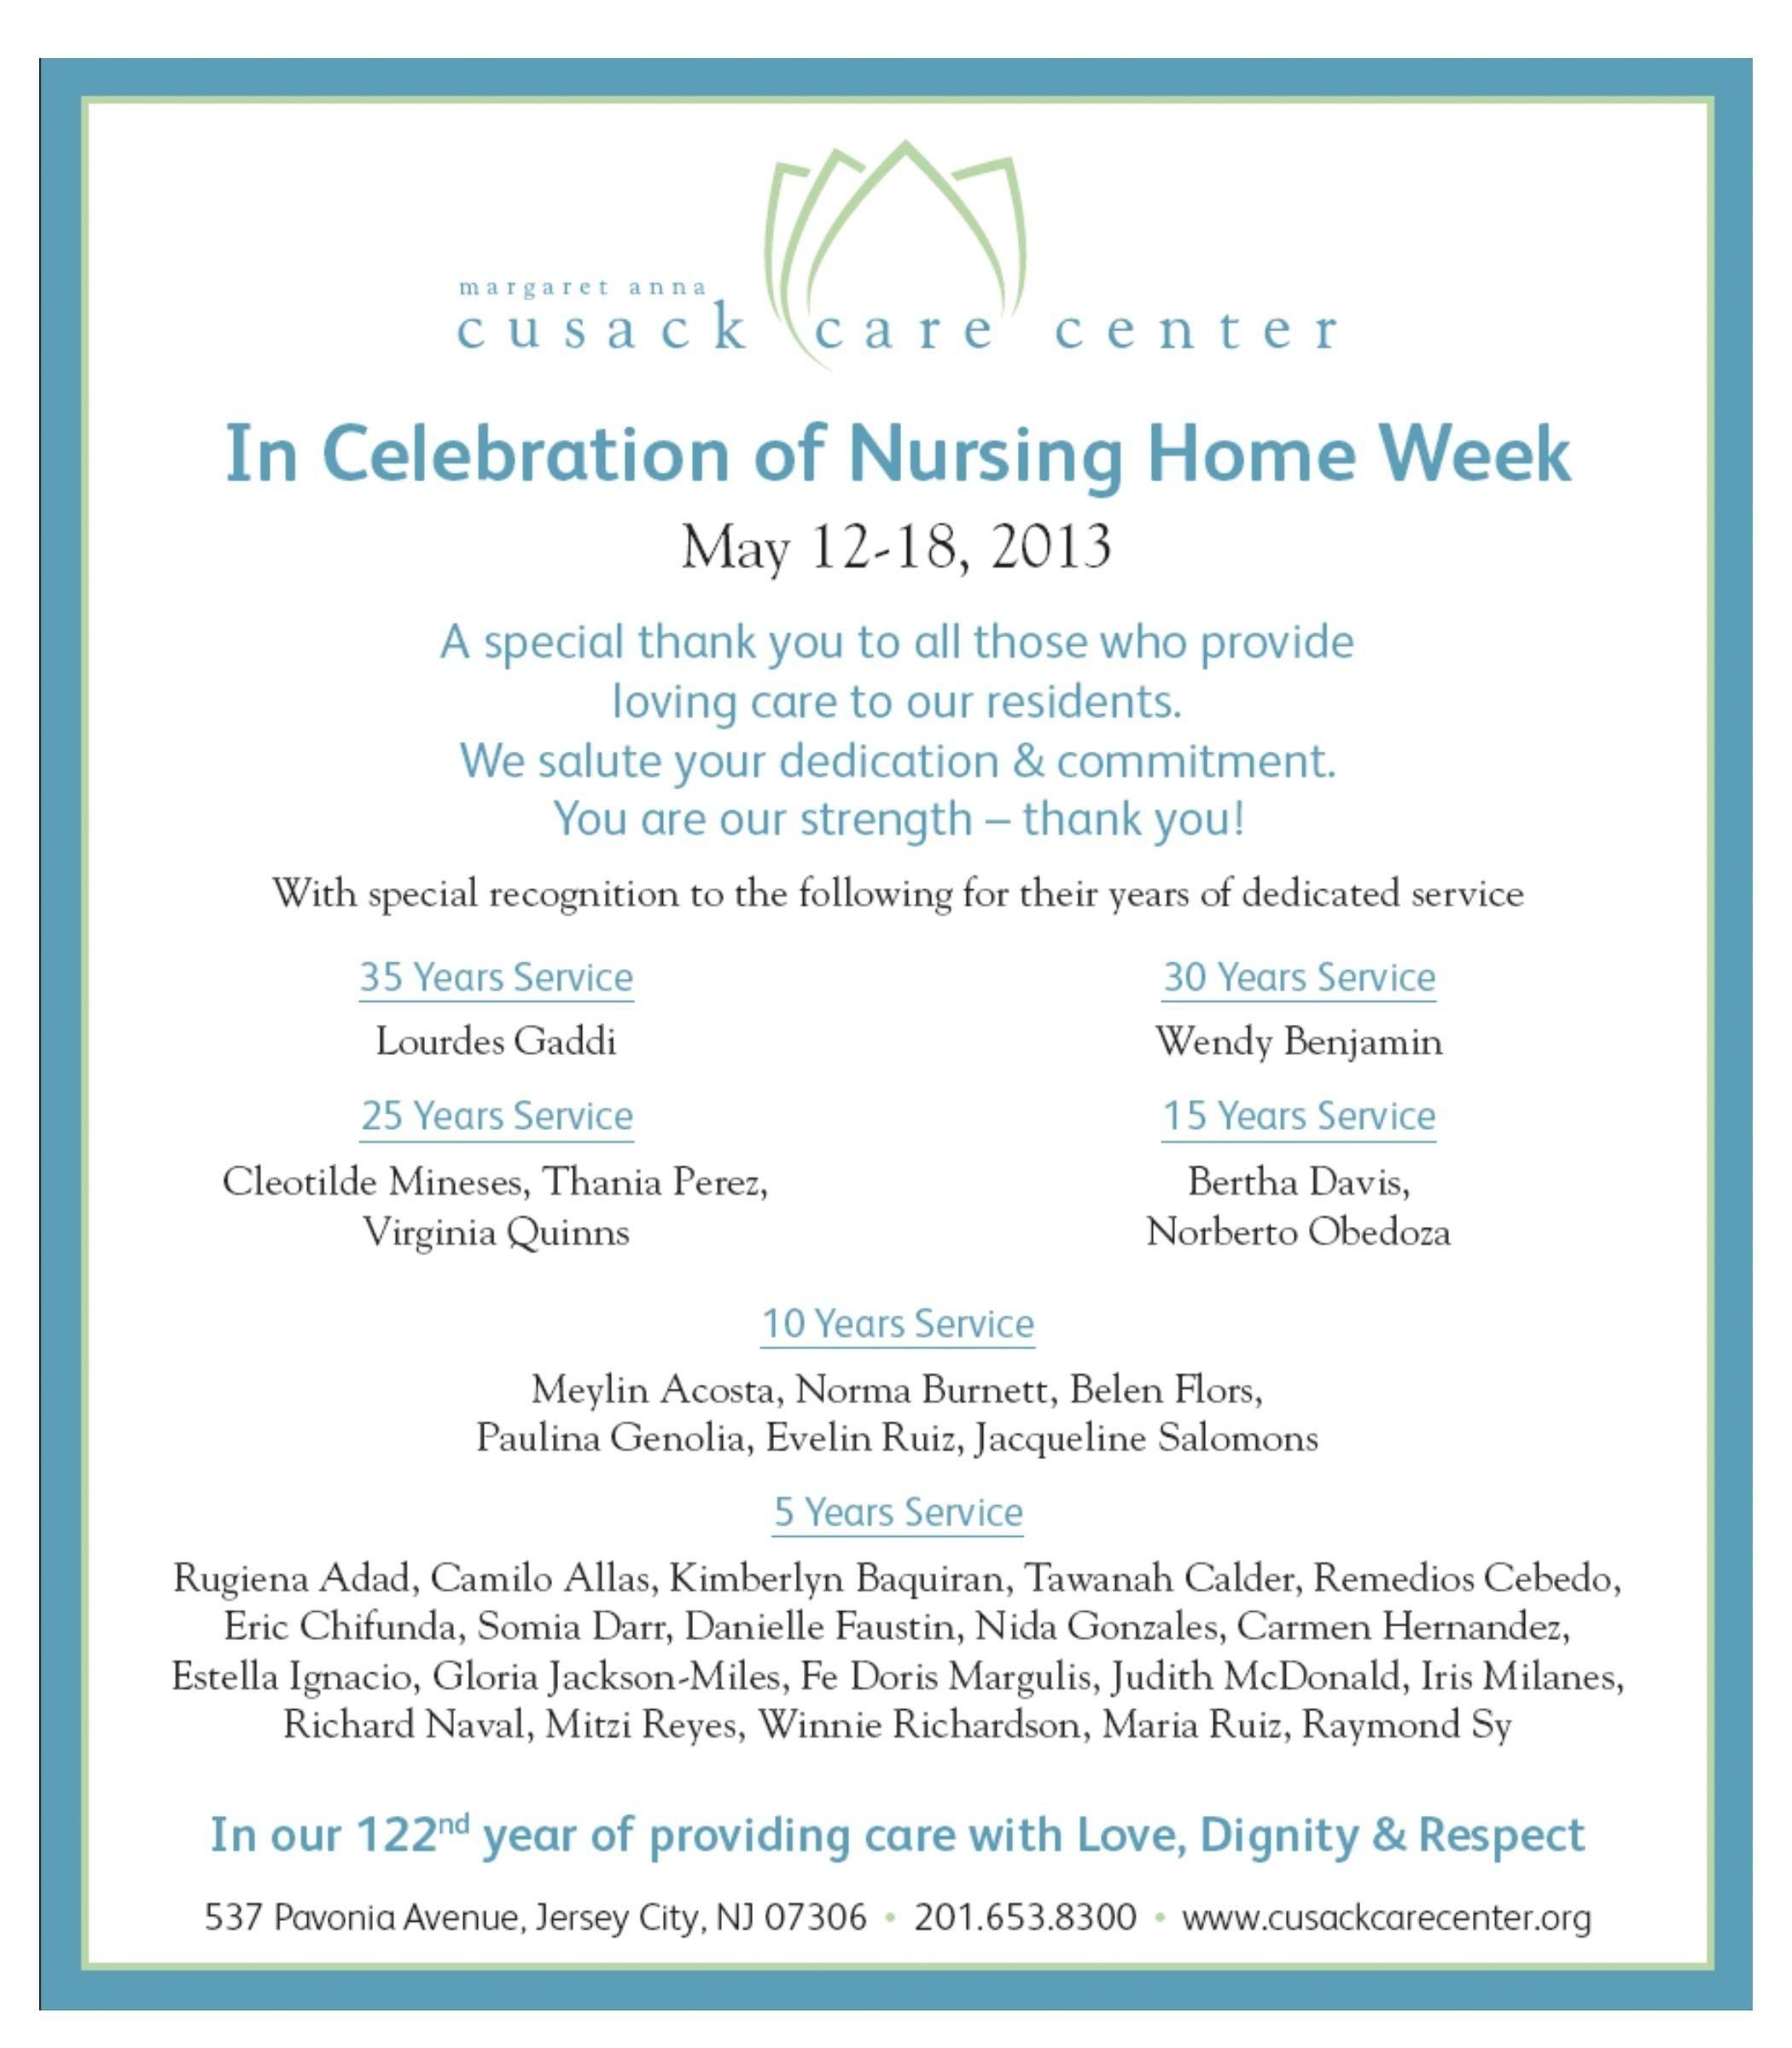 10 Beautiful National Nursing Home Week Ideas may 12 18 2013 its national nursing home week and were 2021